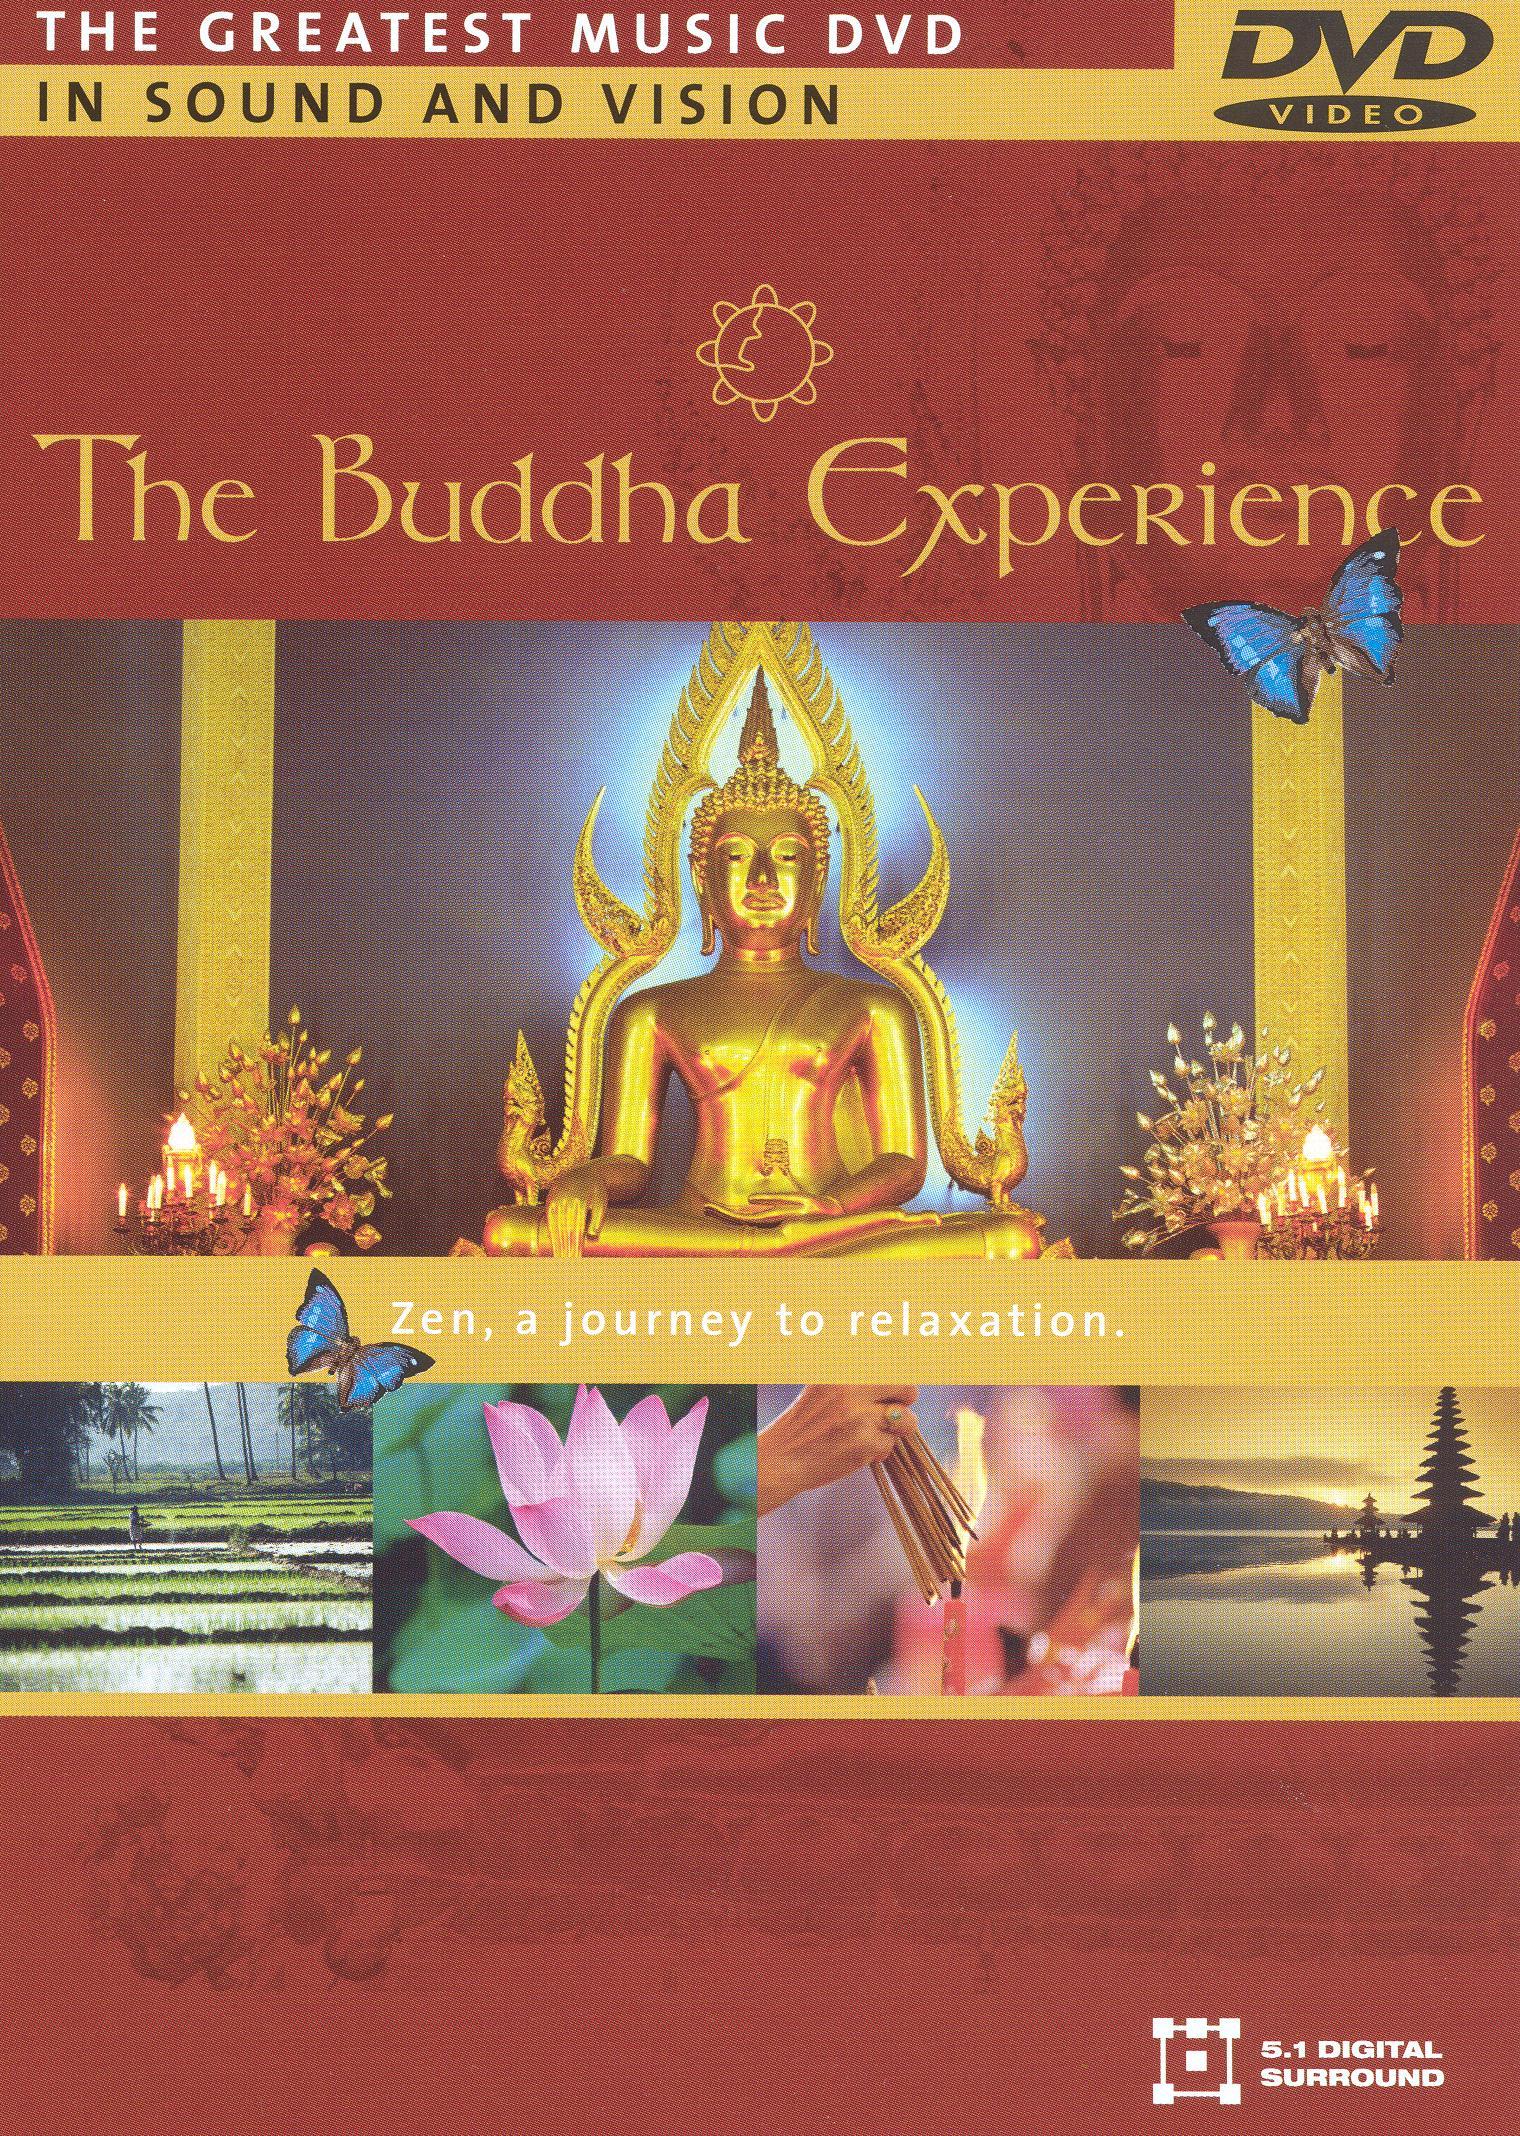 The Buddha Experience